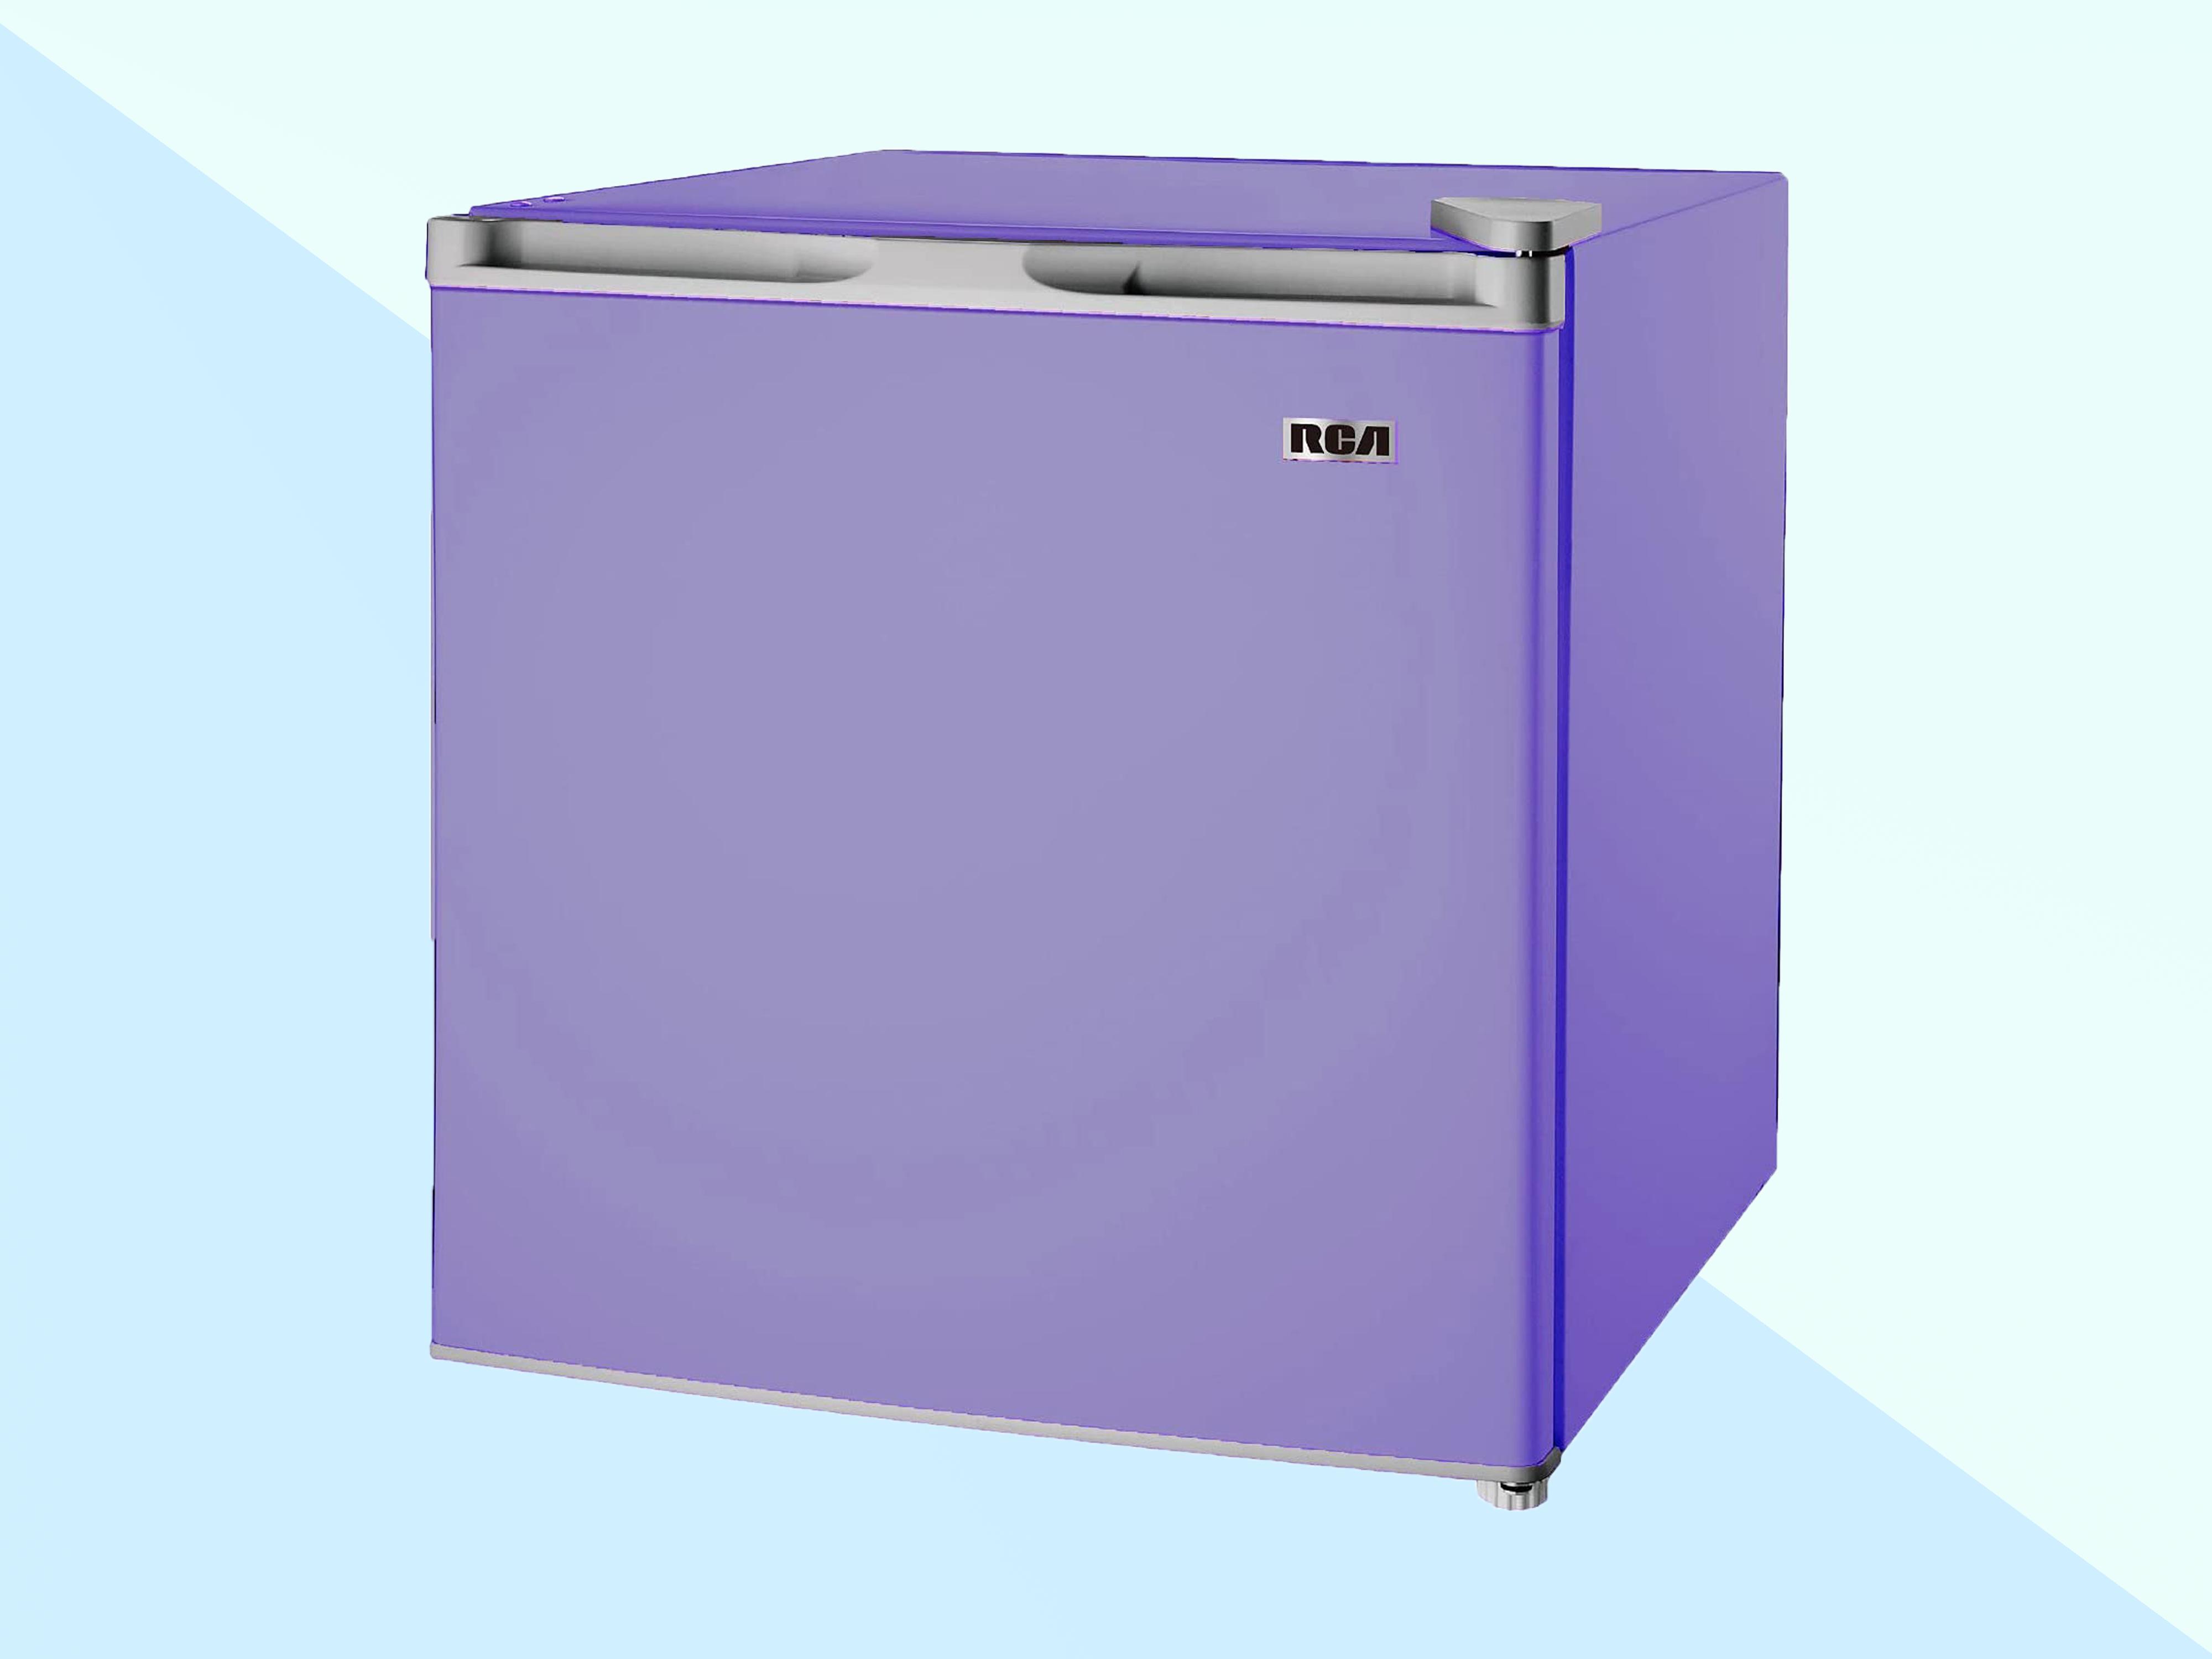 rca-mini-fridge